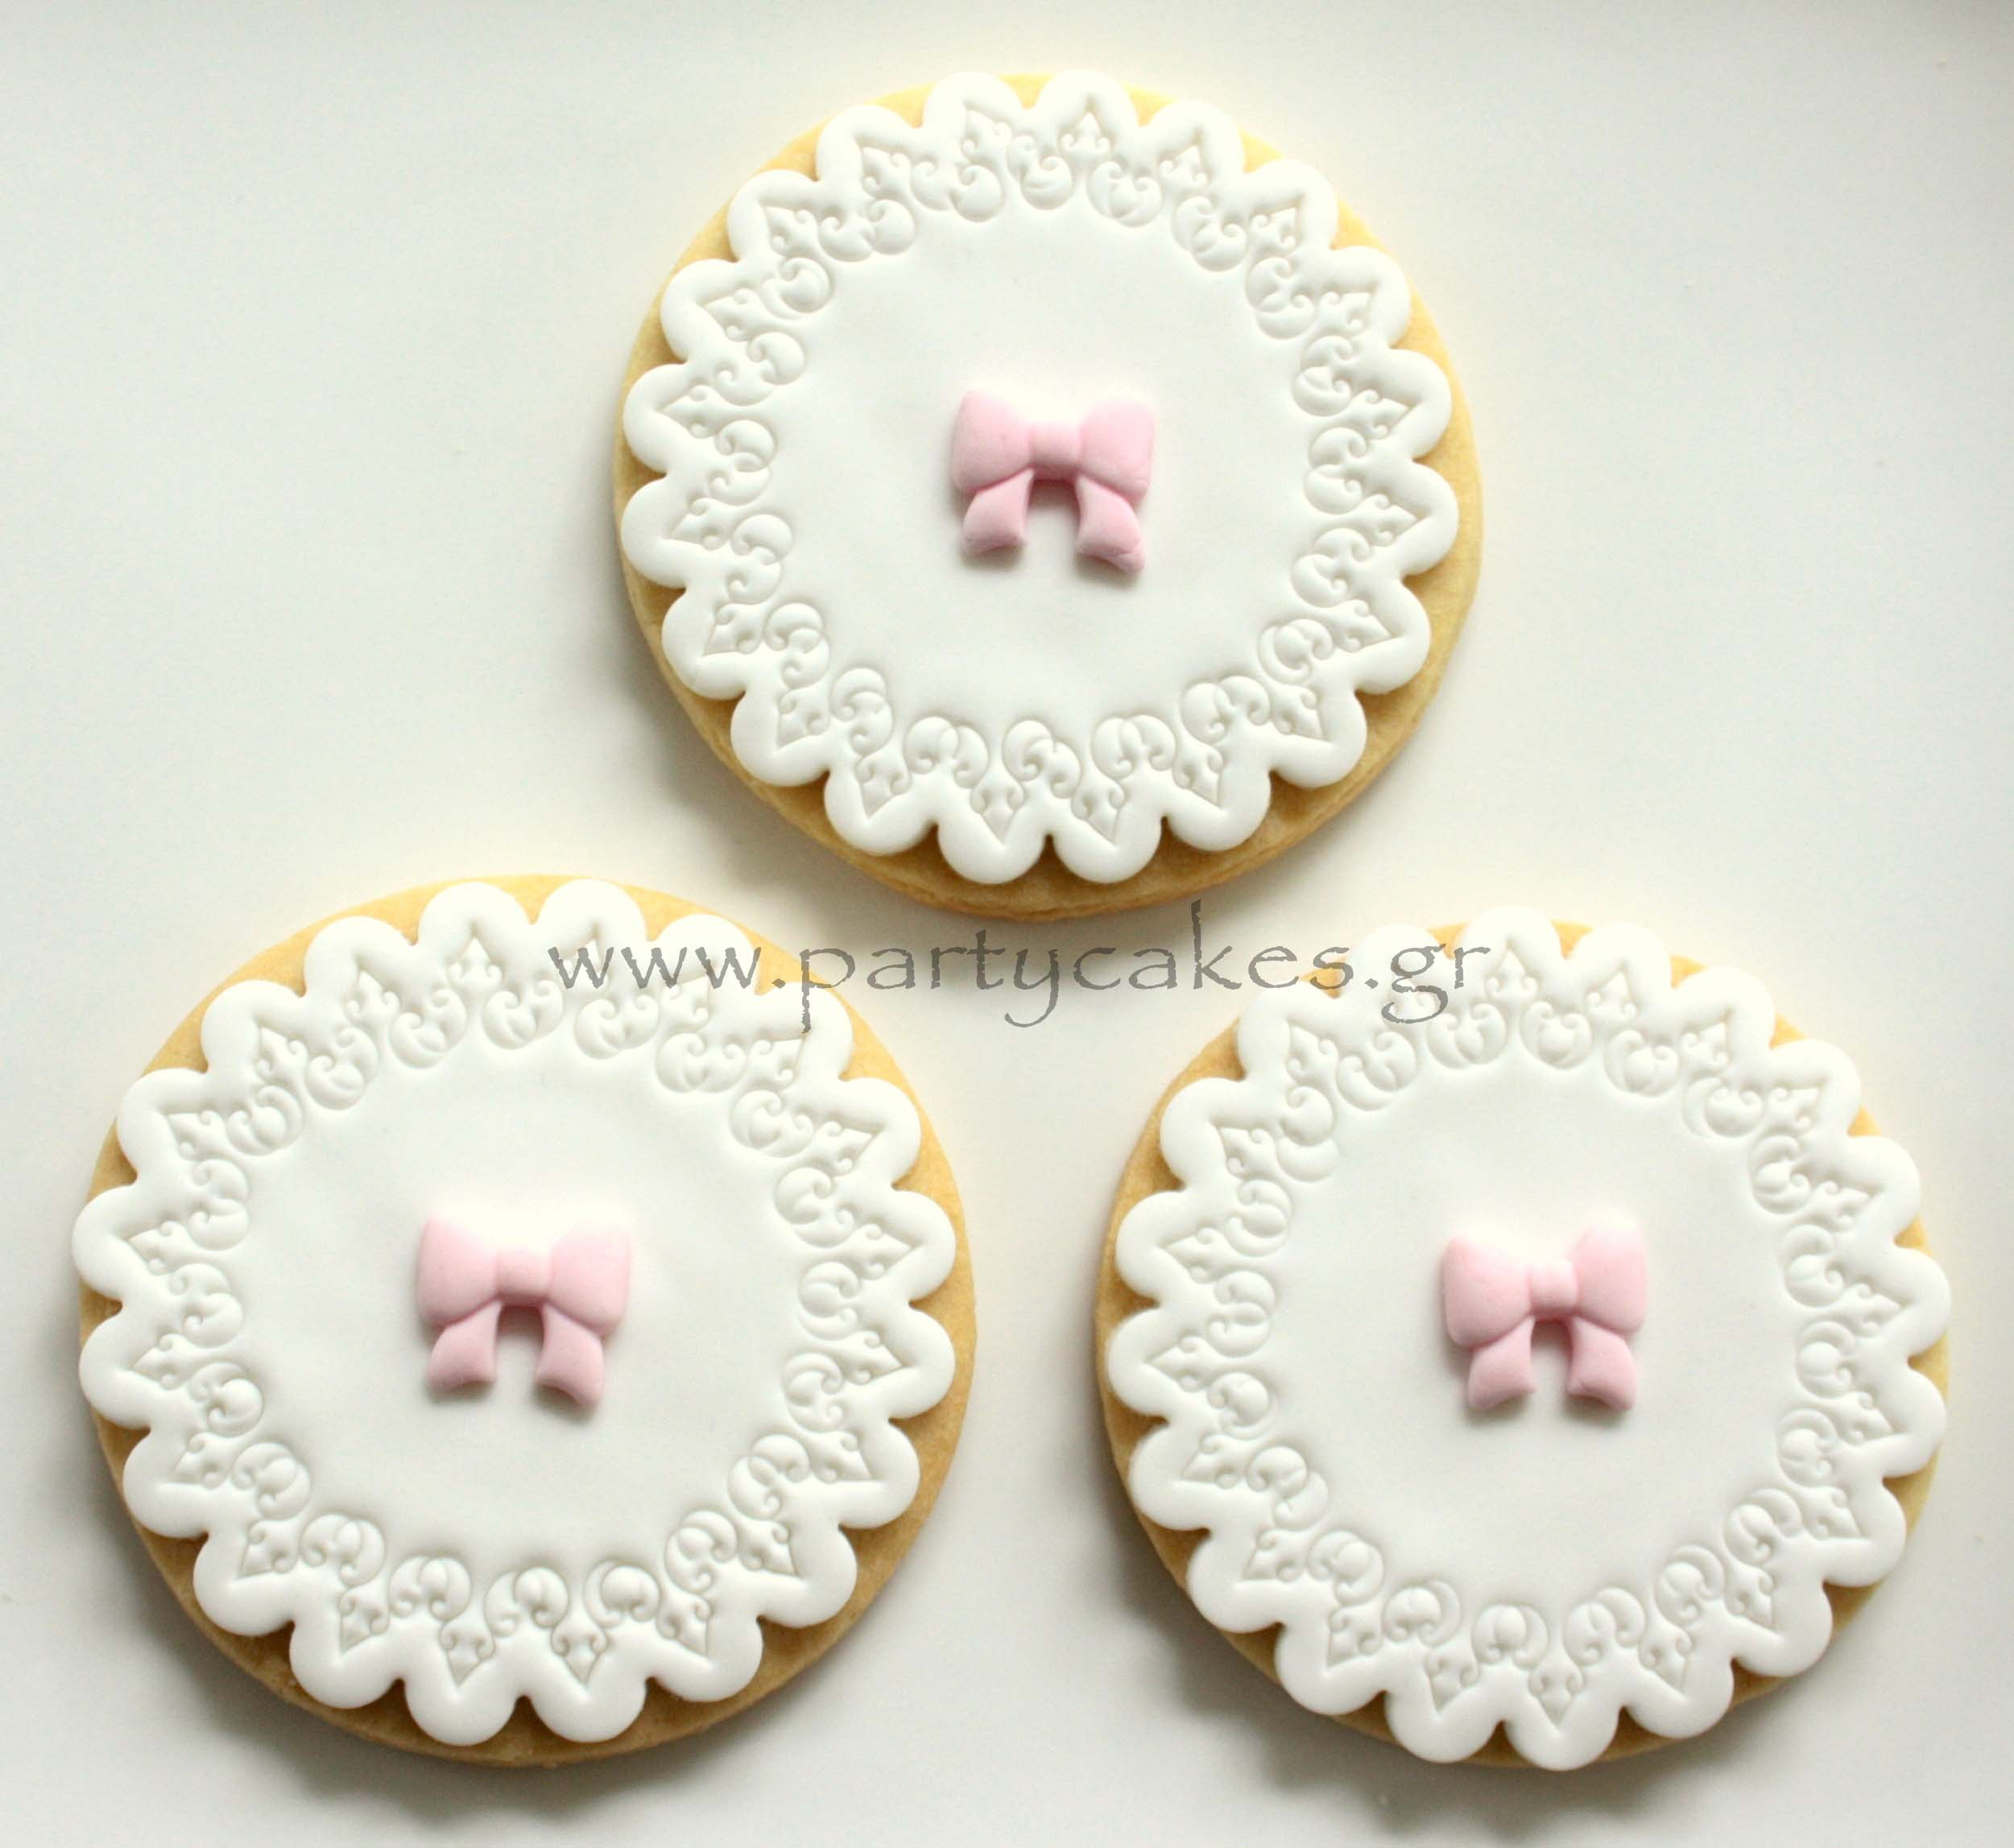 Doily Cookies 2.jpg